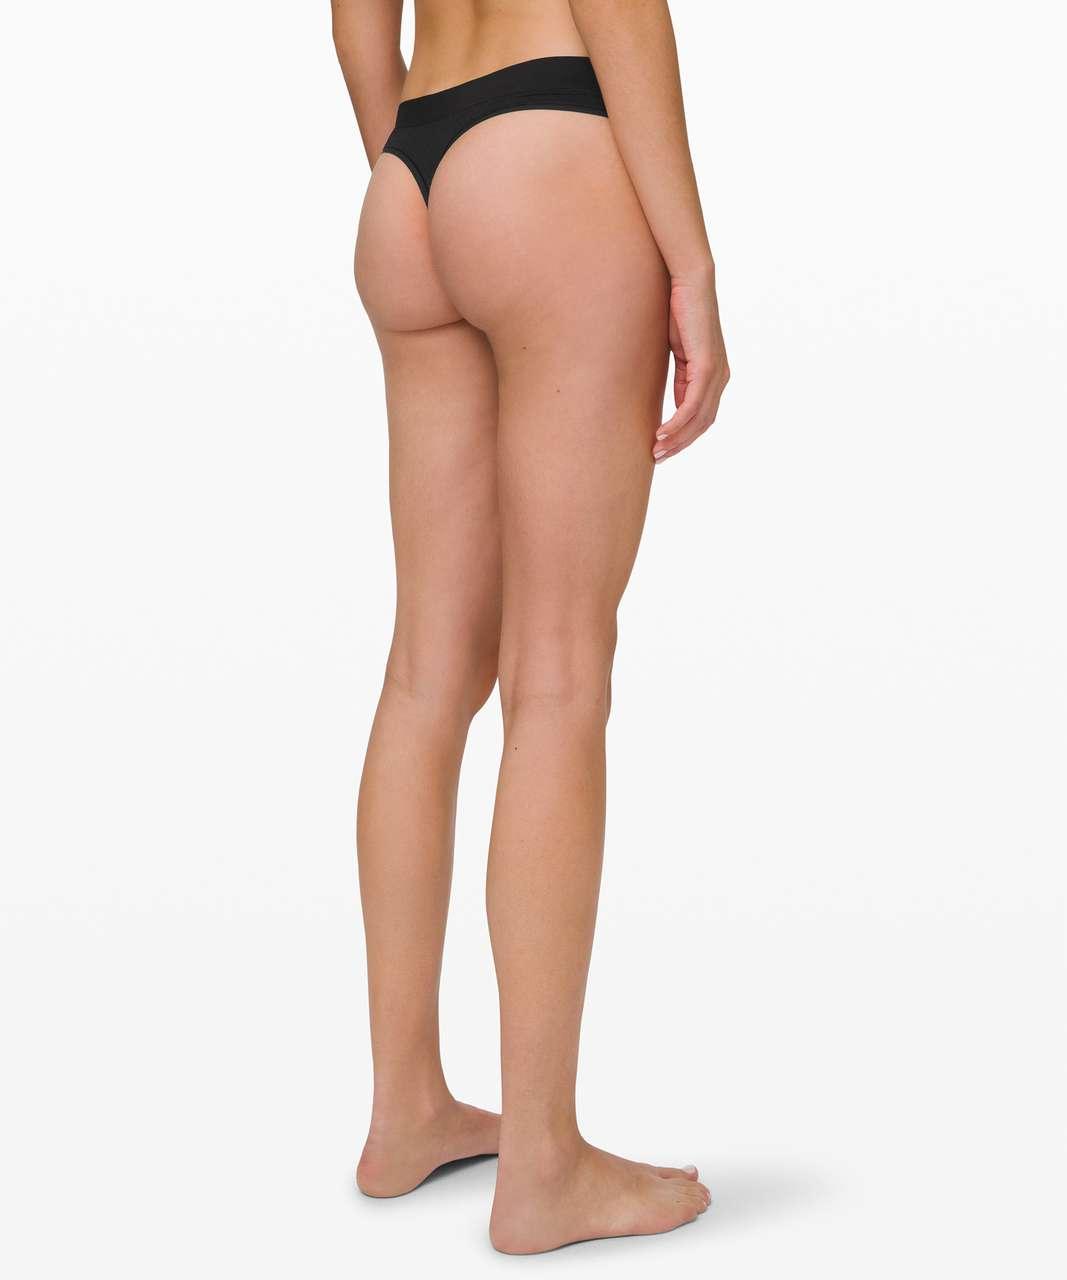 Lululemon Mula Bandhawear Thong *Lace - Black